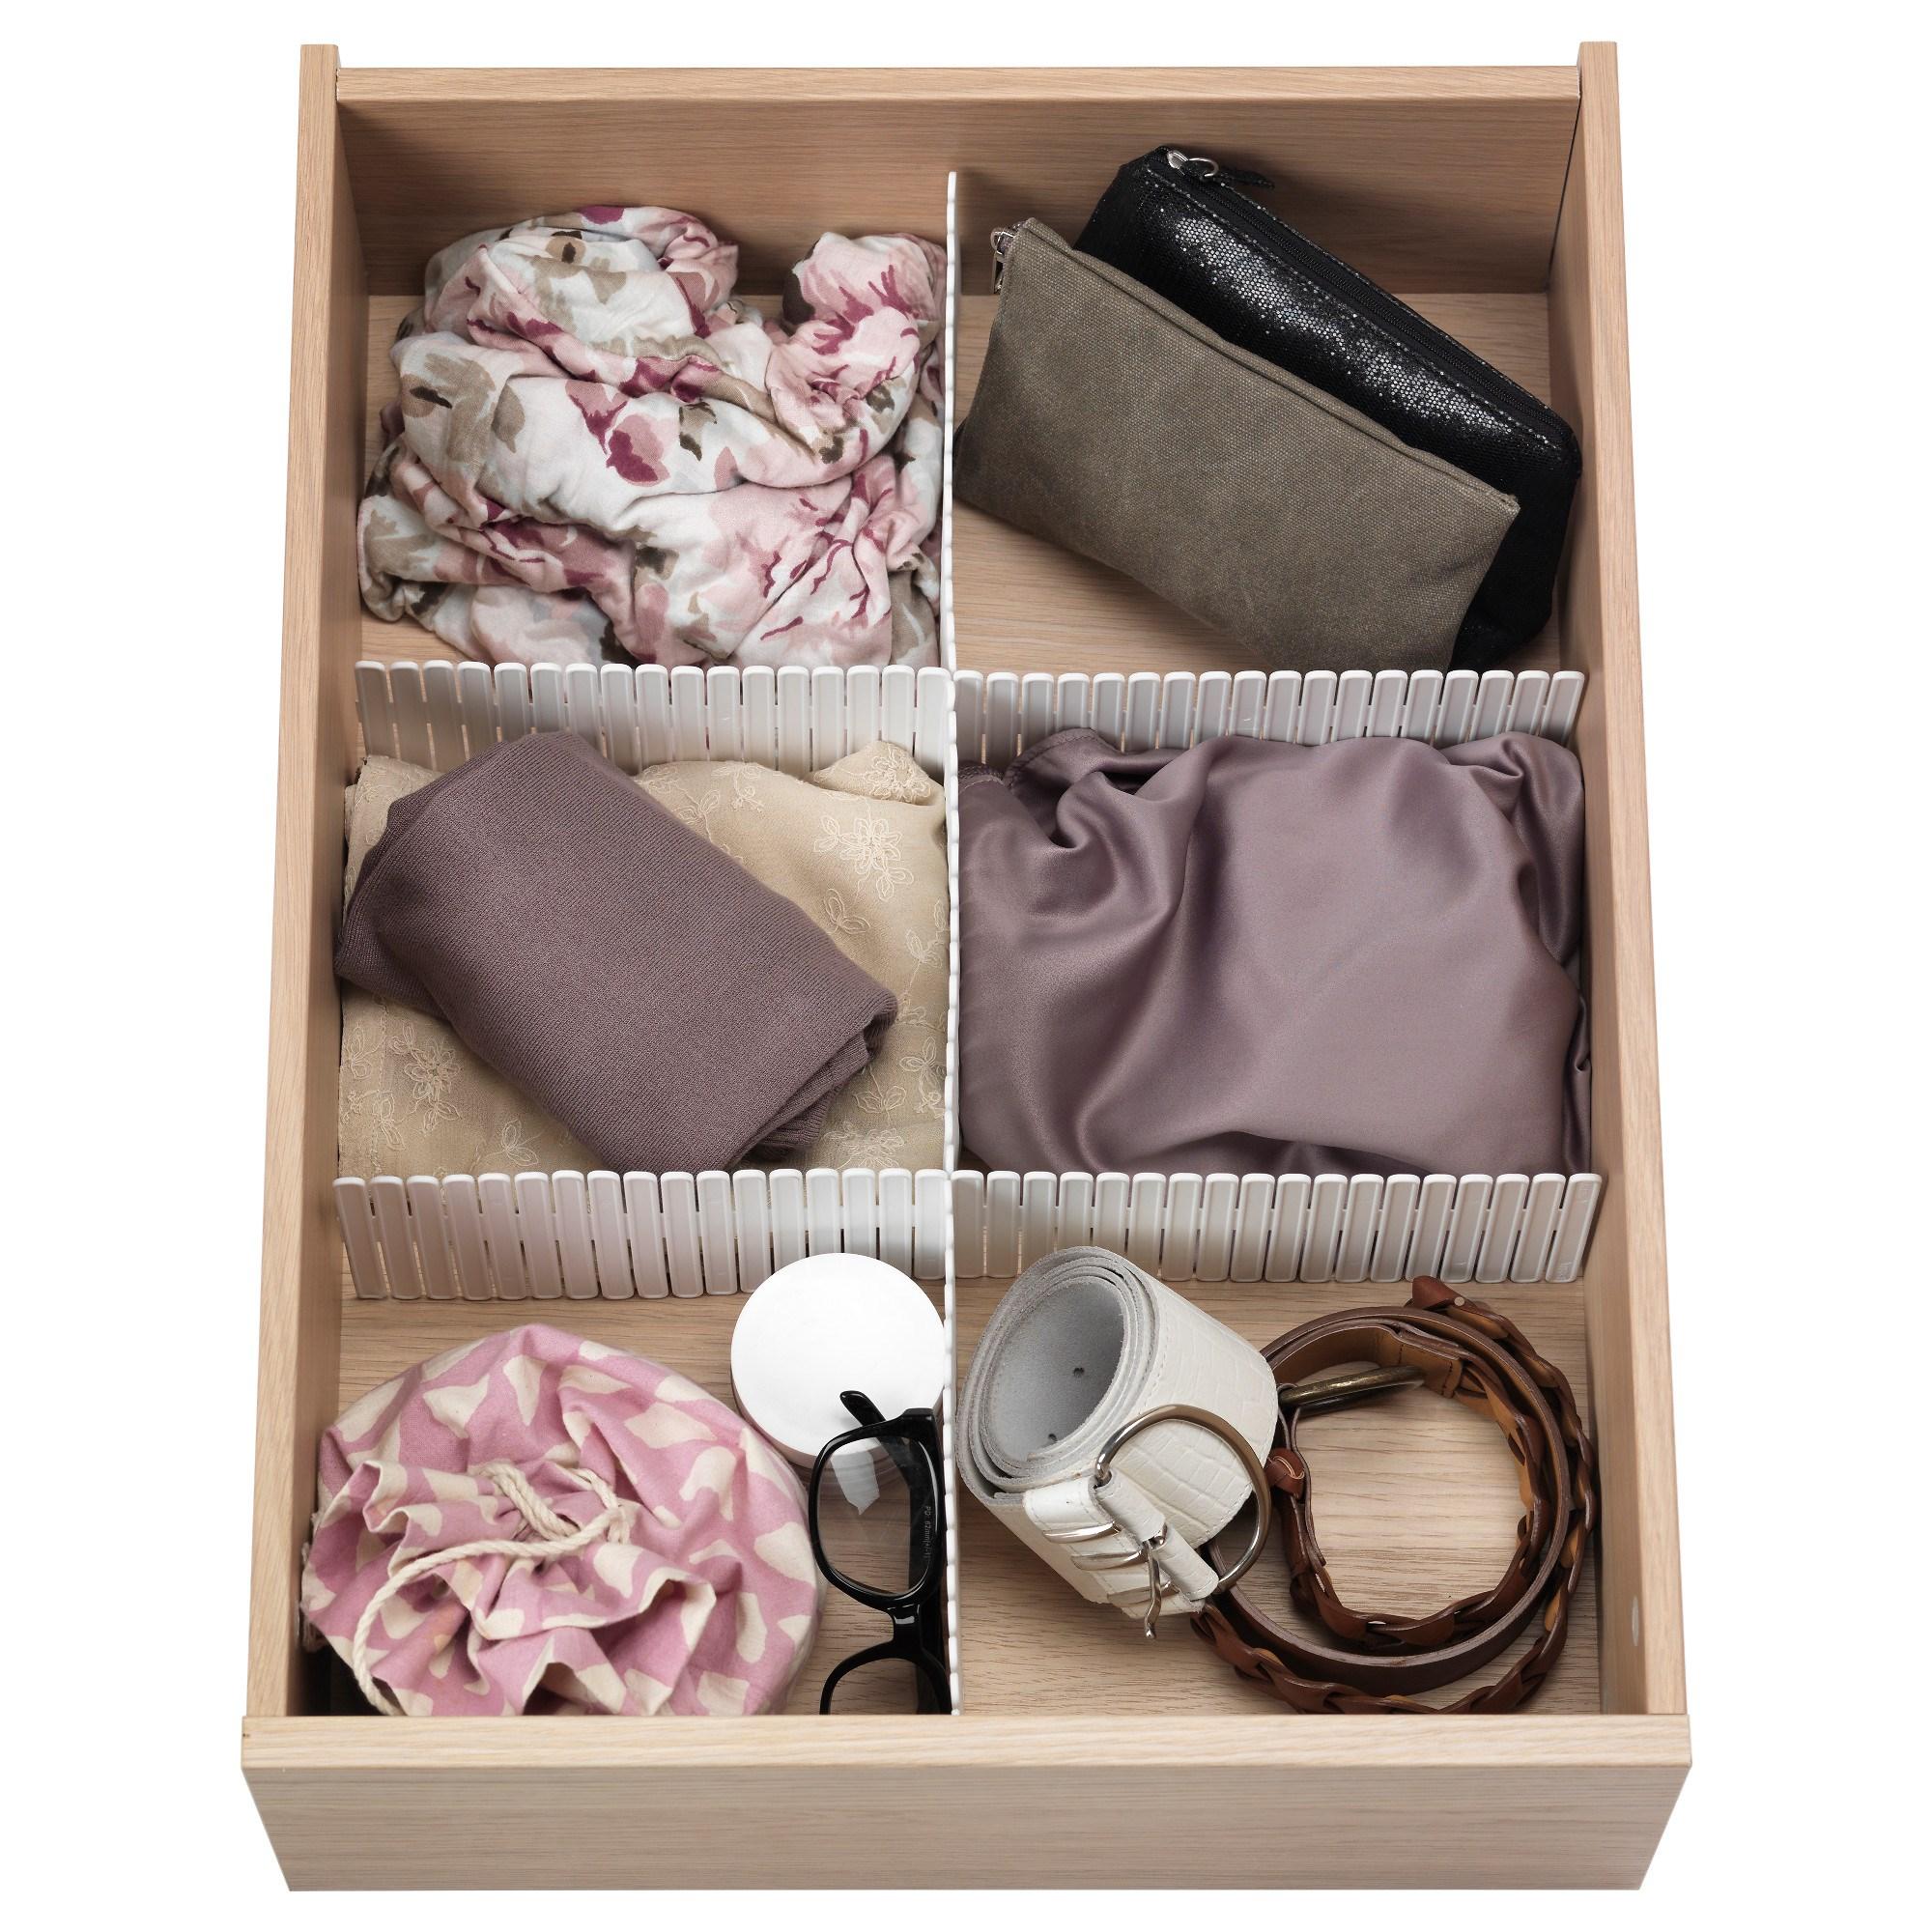 hÖfta drawer organizer white 55x10 cm ikea hallway